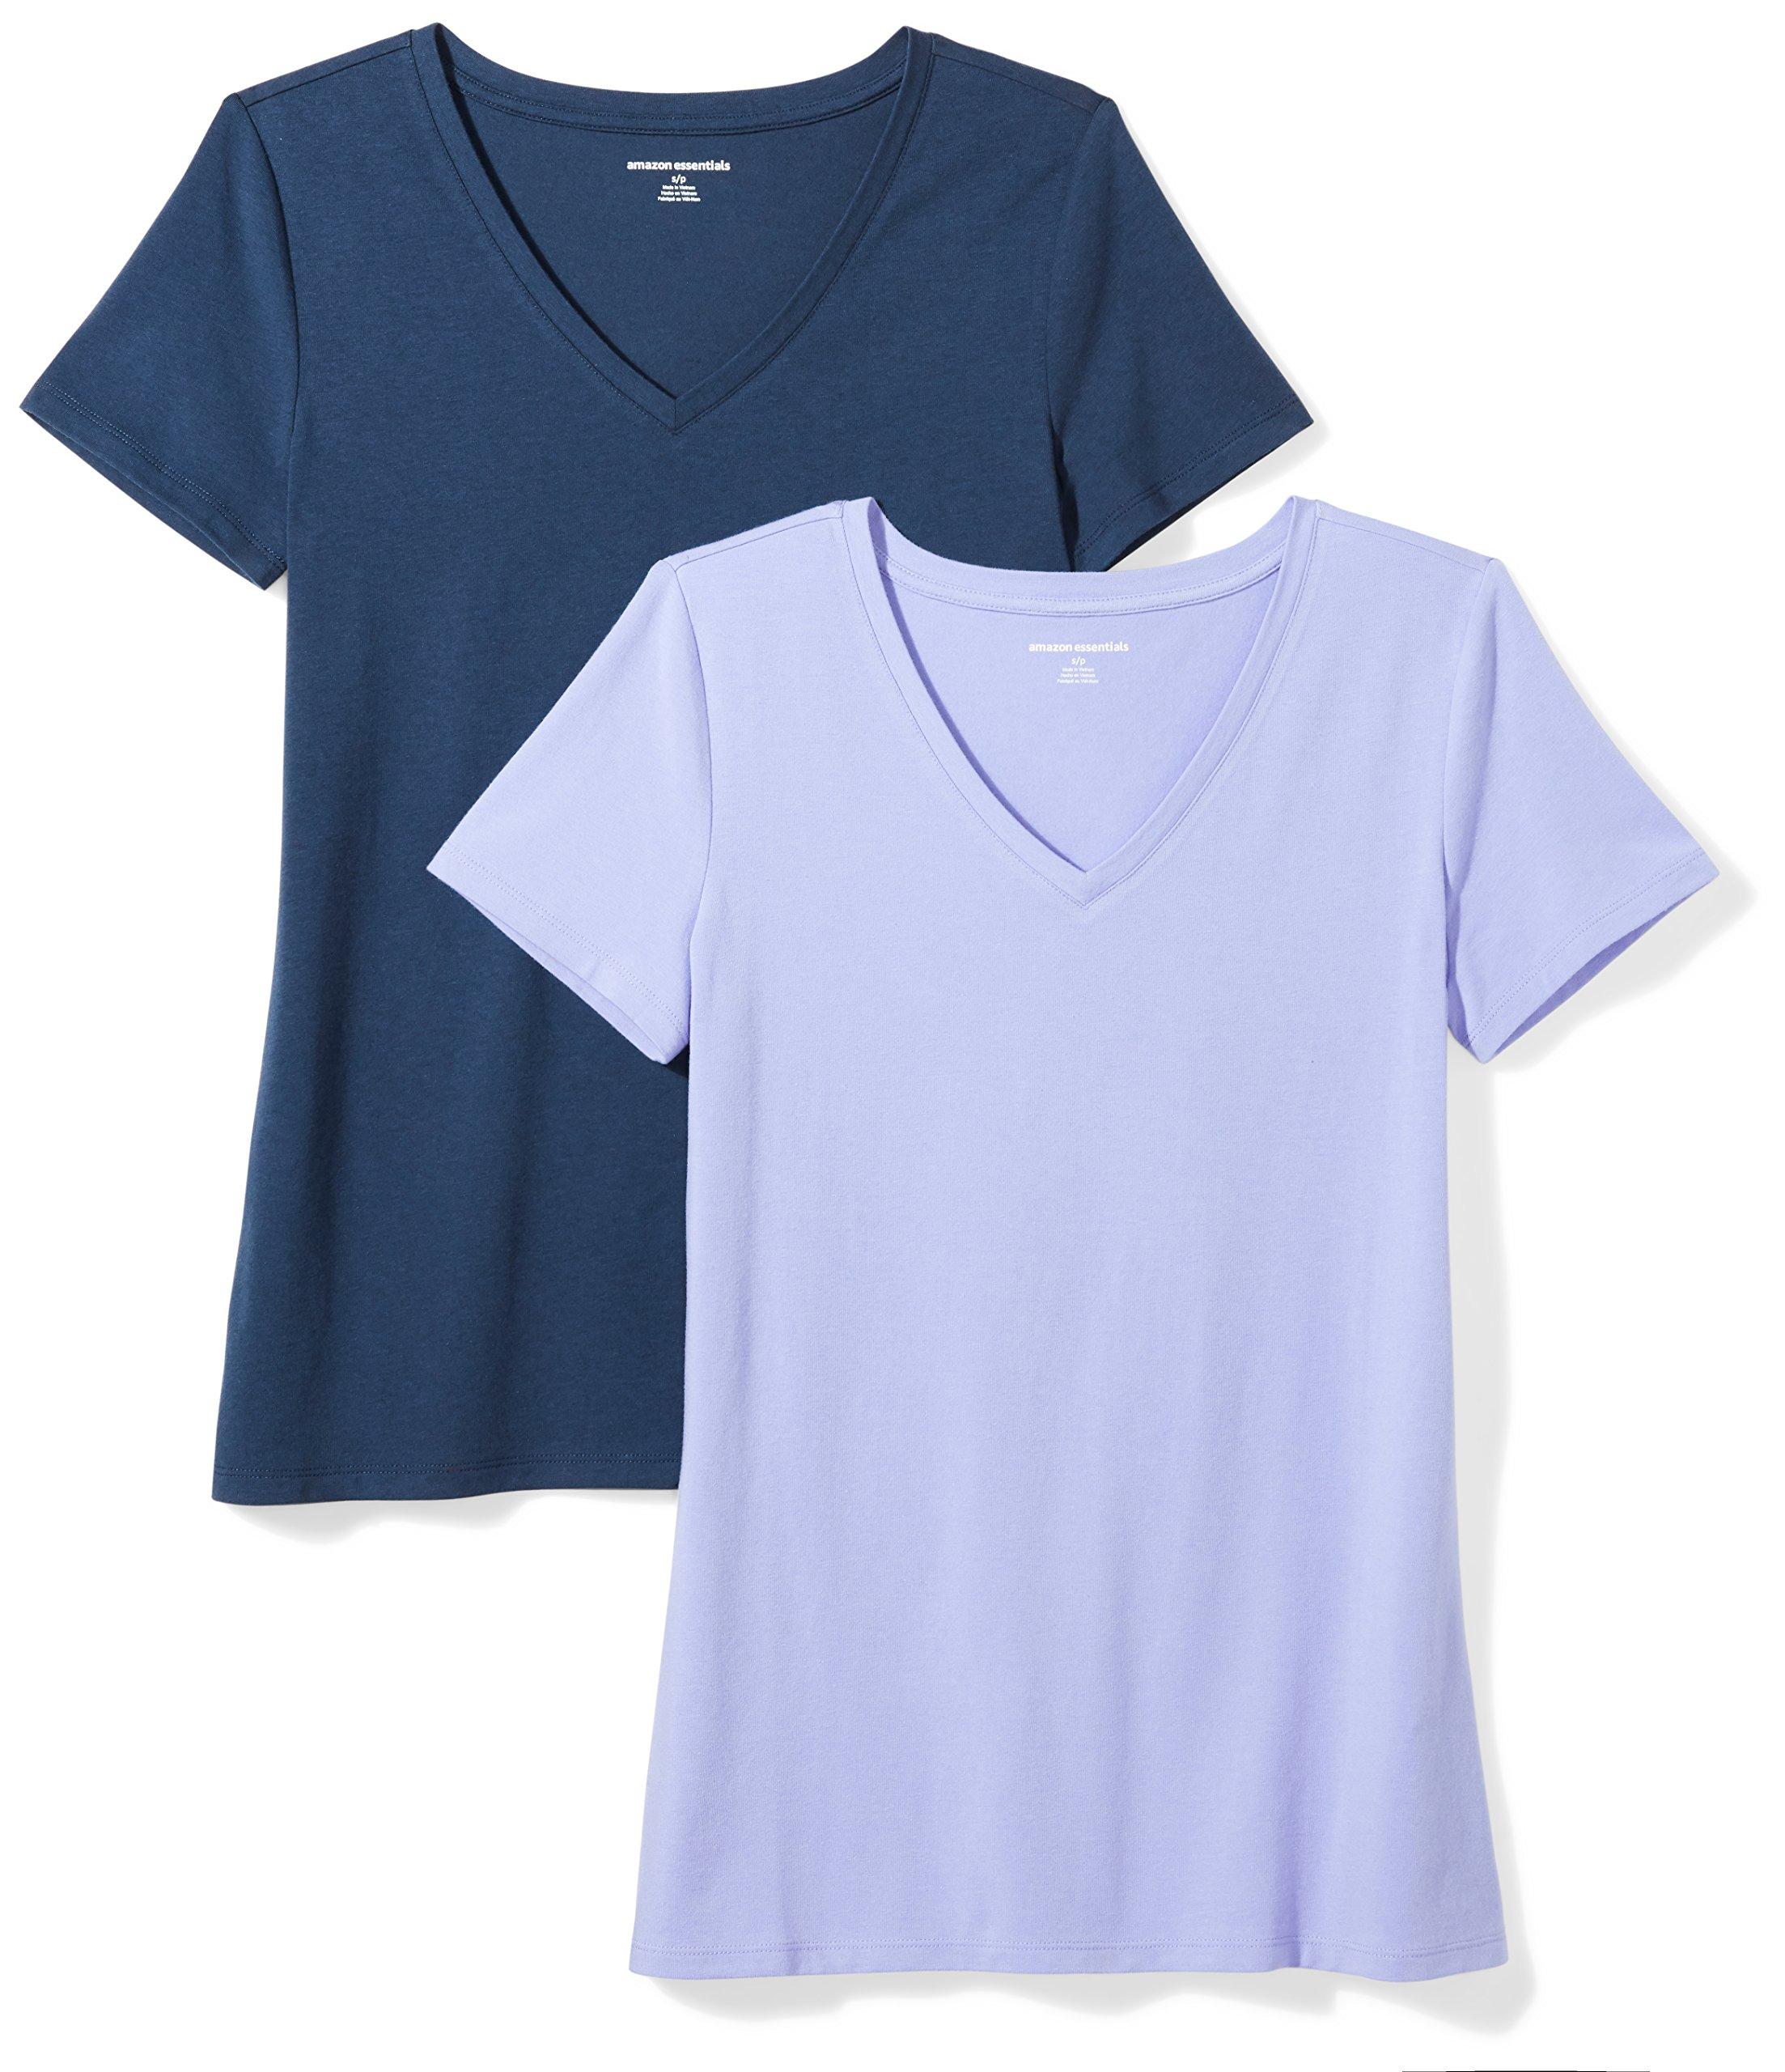 Amazon Essentials Women's 2-Pack Short-Sleeve V-Neck Solid T-Shirt, Purple/Navy, Medium by Amazon Essentials (Image #1)